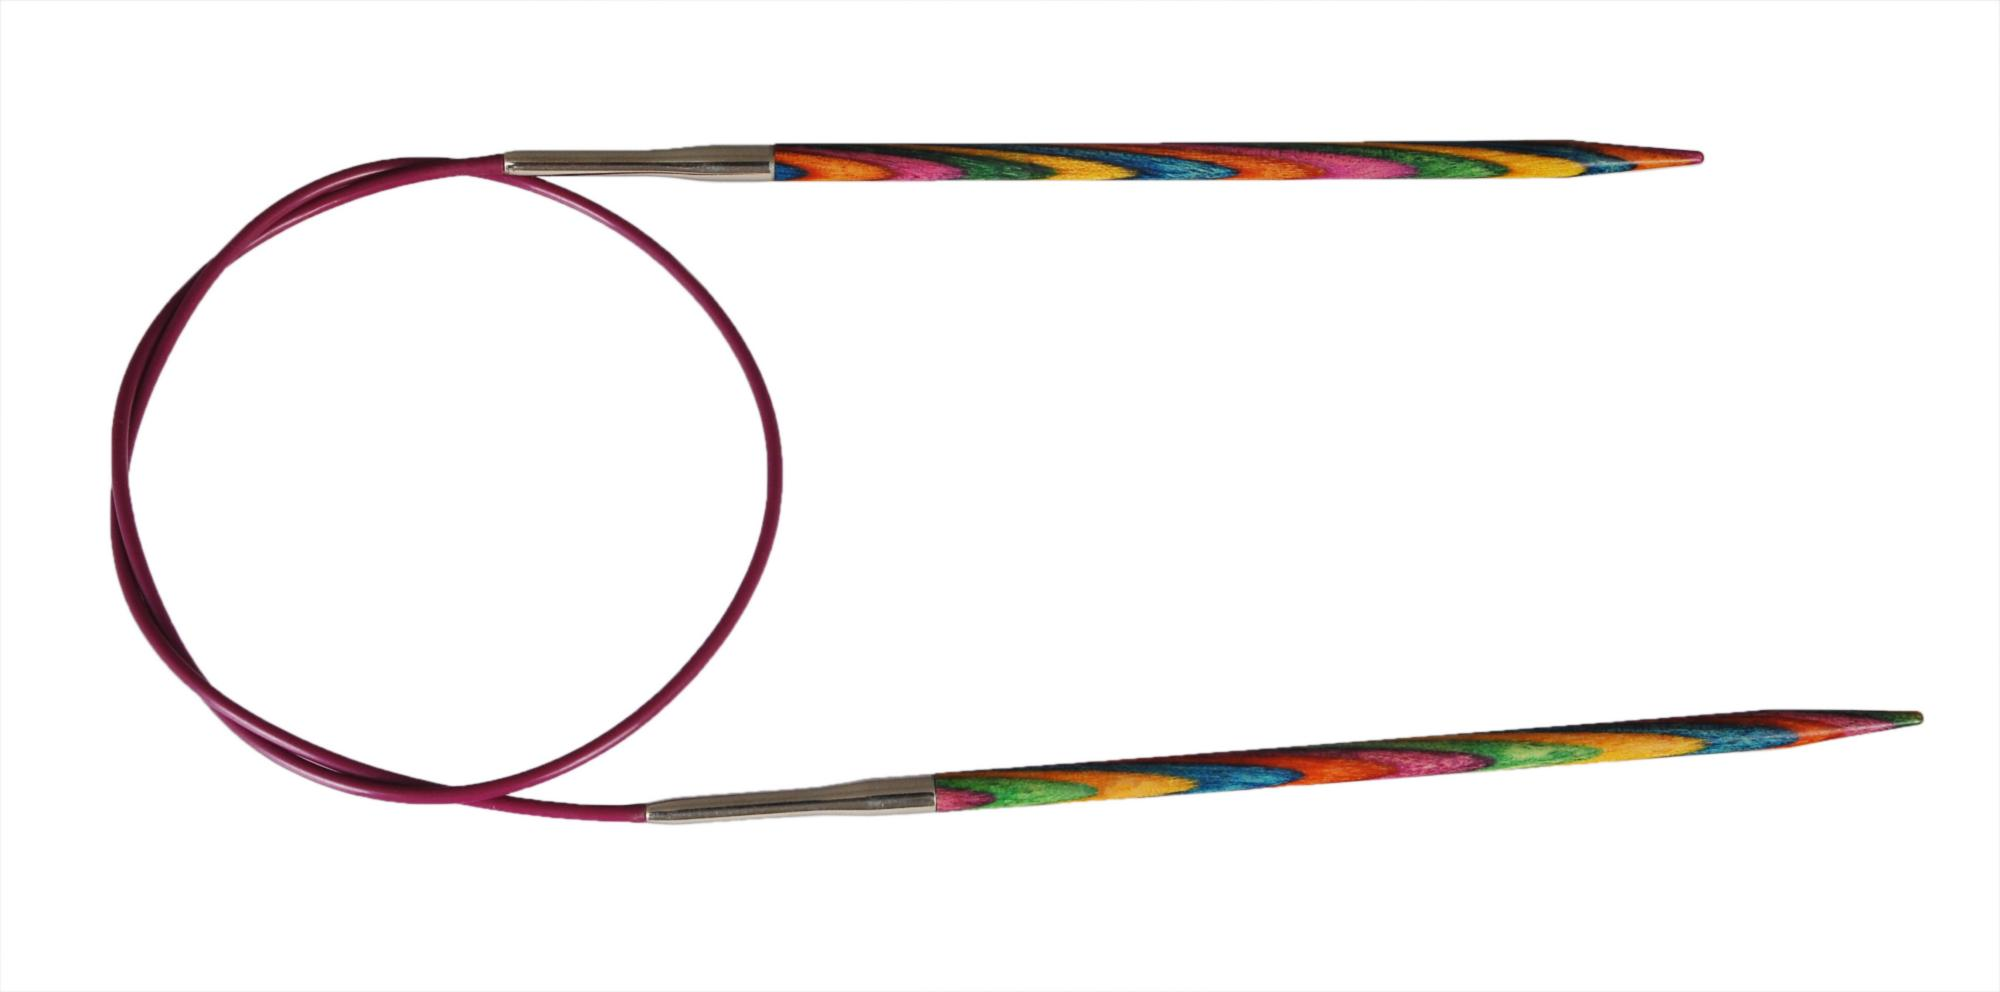 Спицы круговые 50 см Symfonie Wood KnitPro, 20399, 10.00 мм